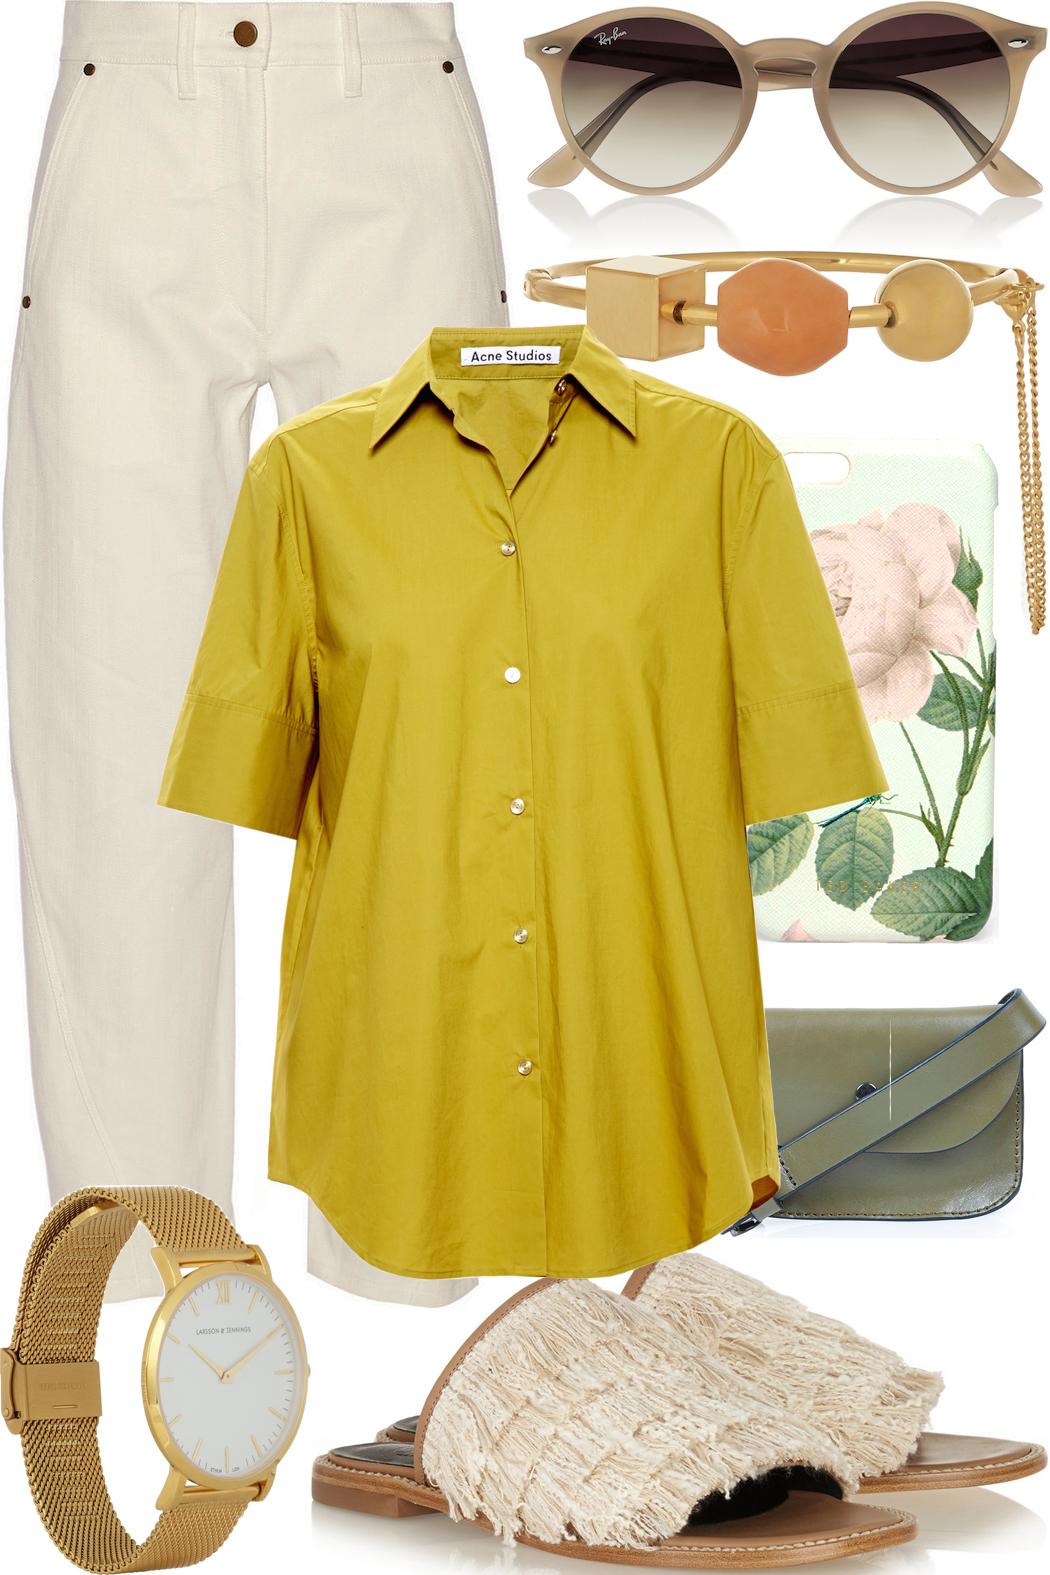 Shopping Acne shirt fash-n-chips.com